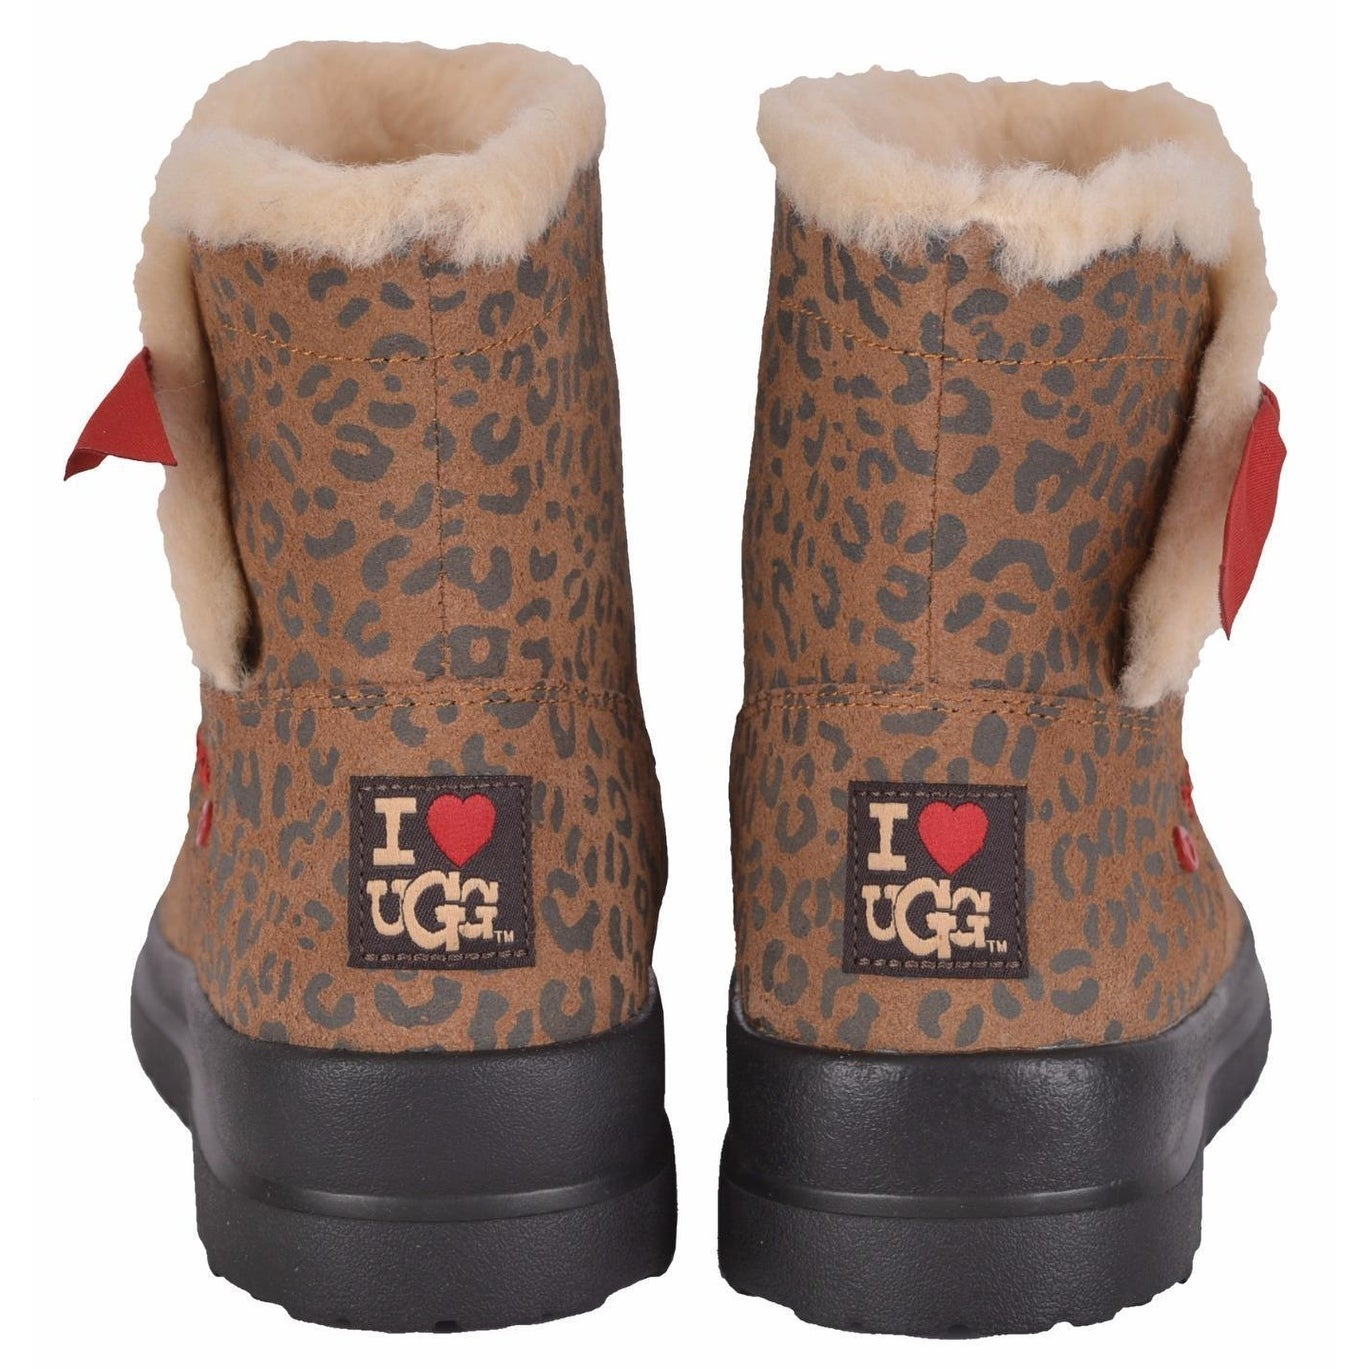 07957b62d0f UGG Women's I Heart Knotty Leopard Print Shearling Wool Snow Boots Shoes